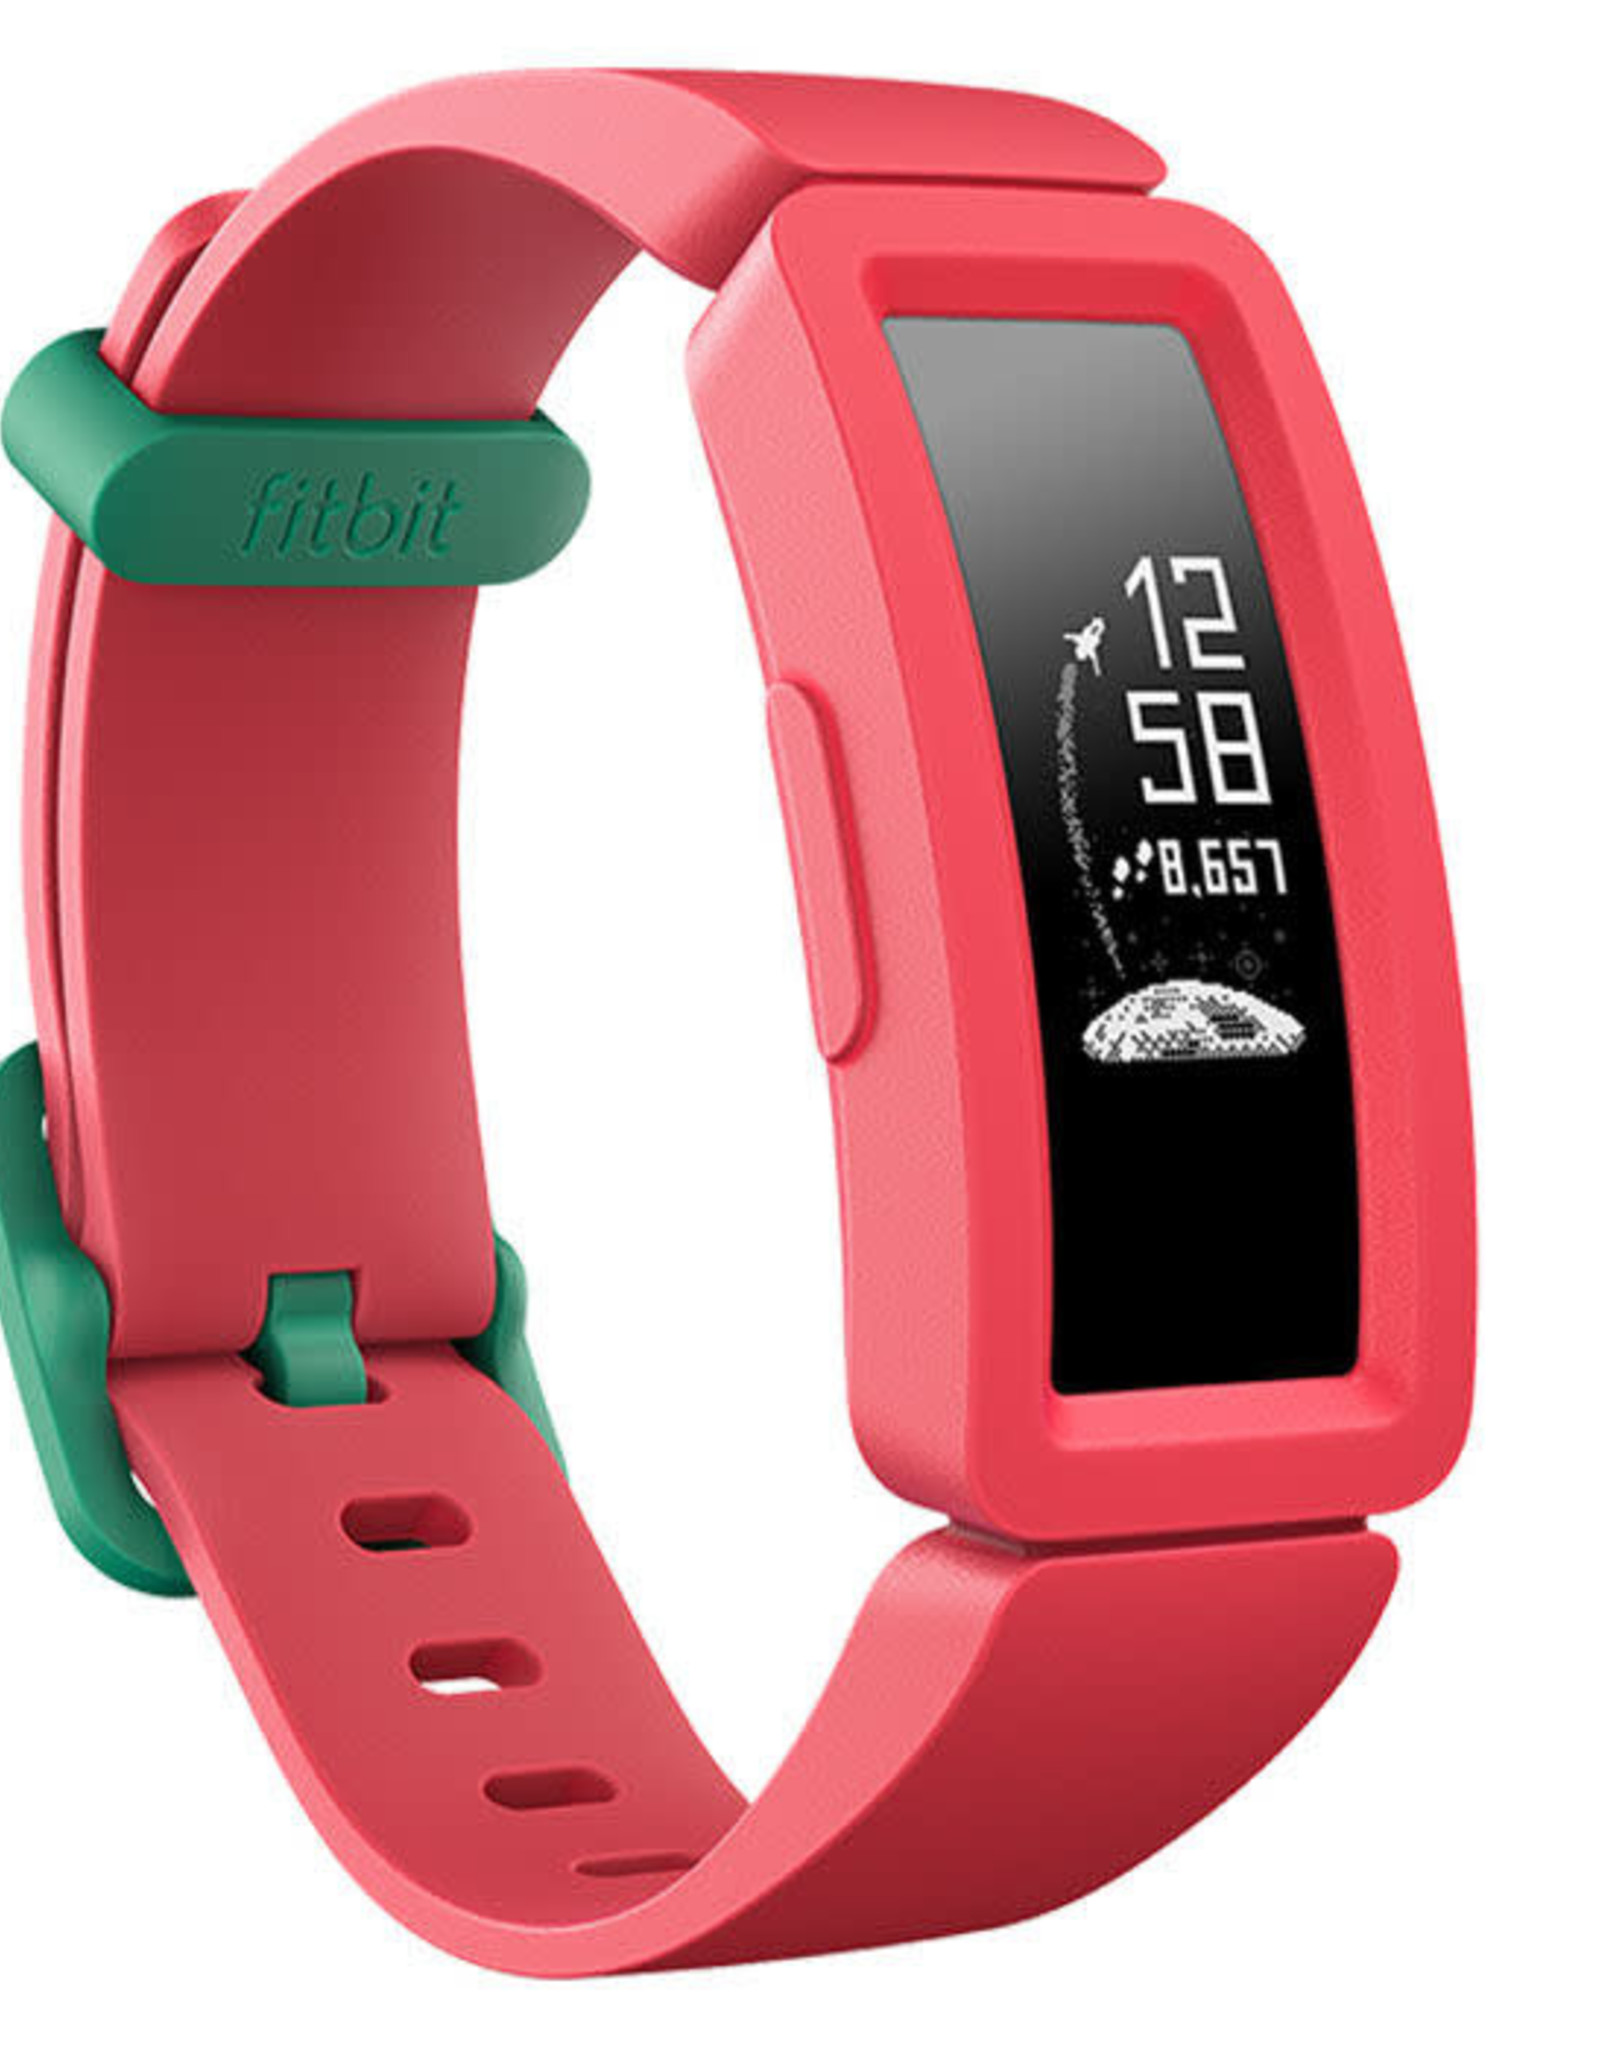 Fitbit Fitbit   Ace 2 Watermelon and Teal   FB414BKPKFRCJK